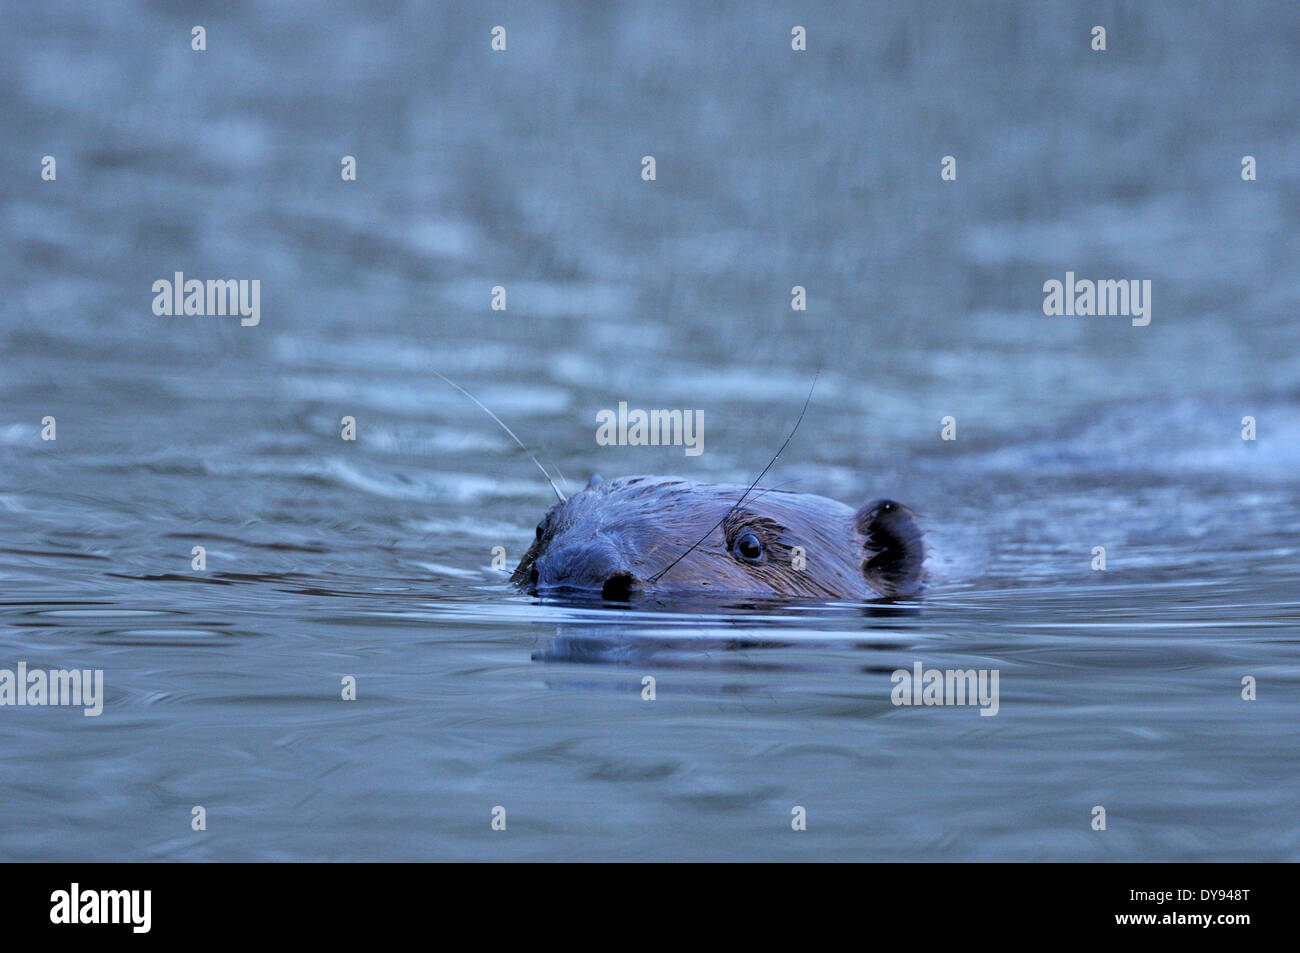 Beavers rodents Castor fiber rodent European beaver mammals rodents beaver damages swimming animal animals Germany Europe, - Stock Image